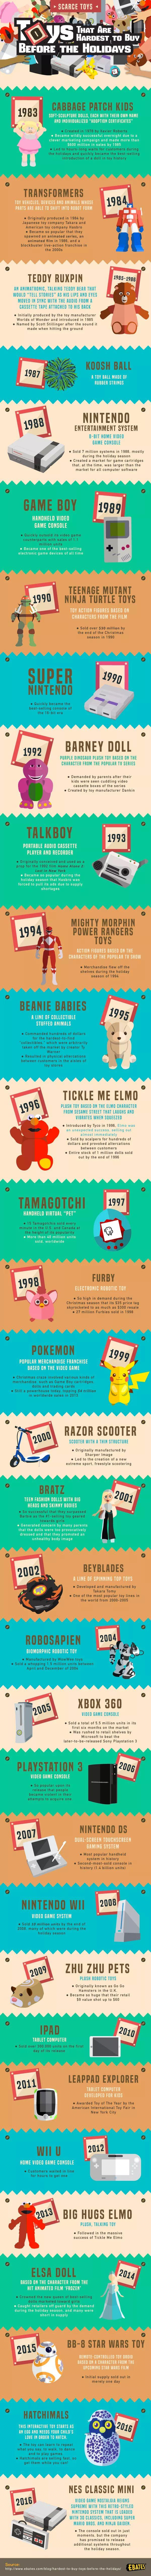 Popular toys on Pinterest